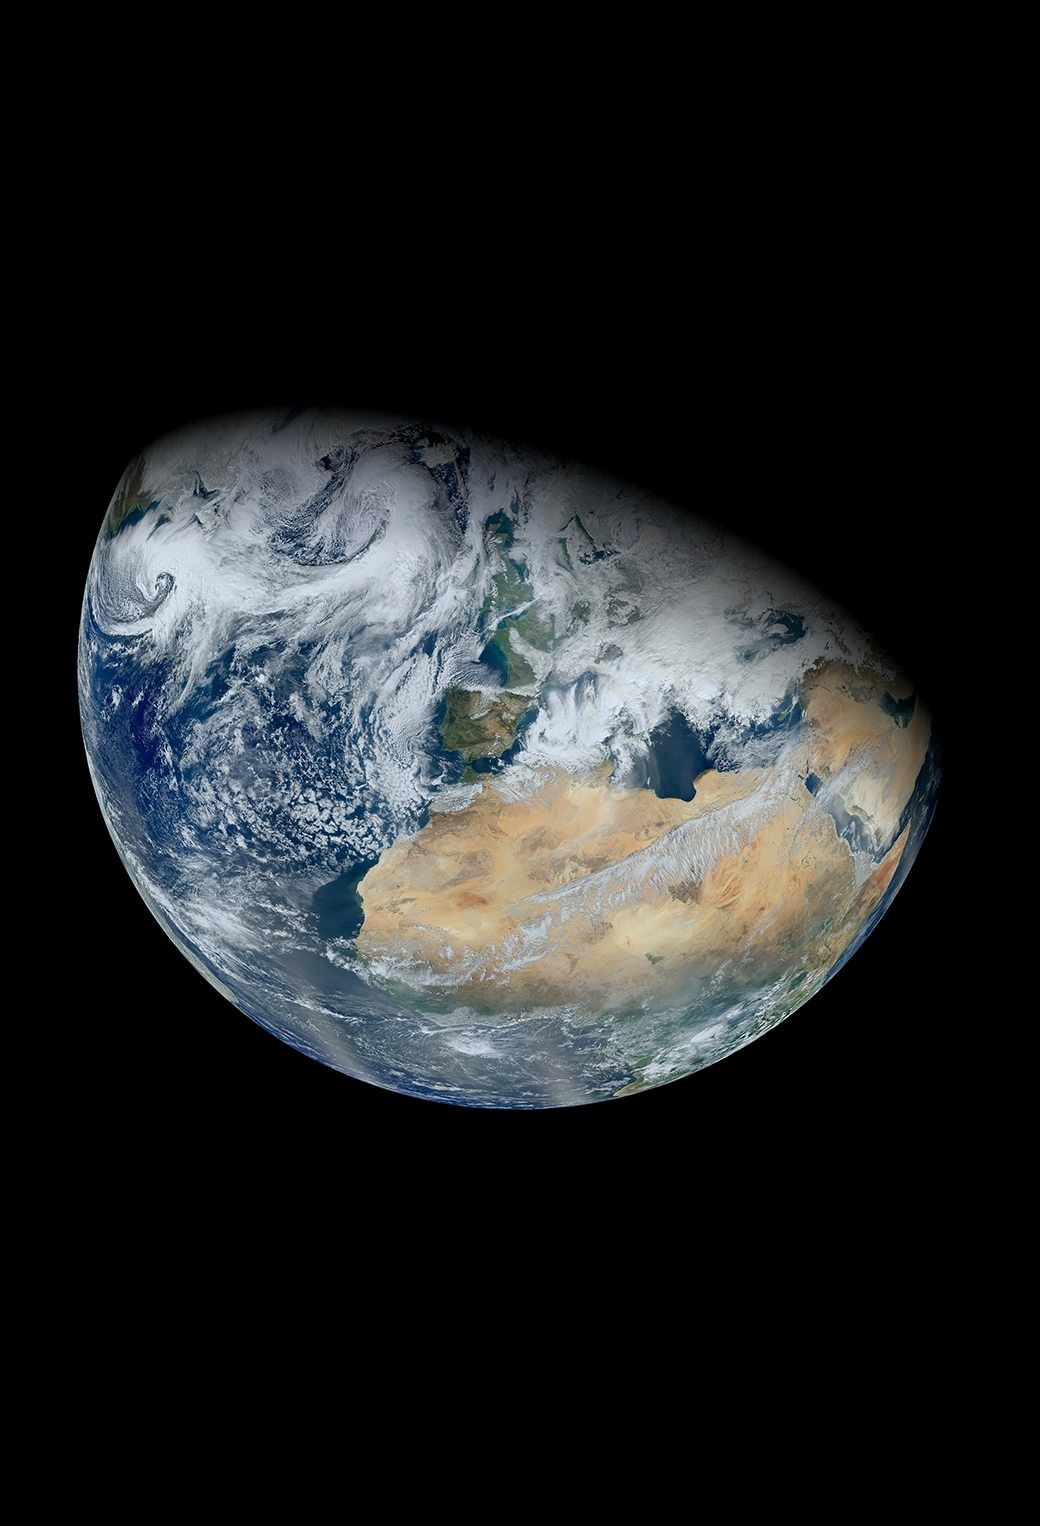 Earth Wallpaper 4k Phone Gallery